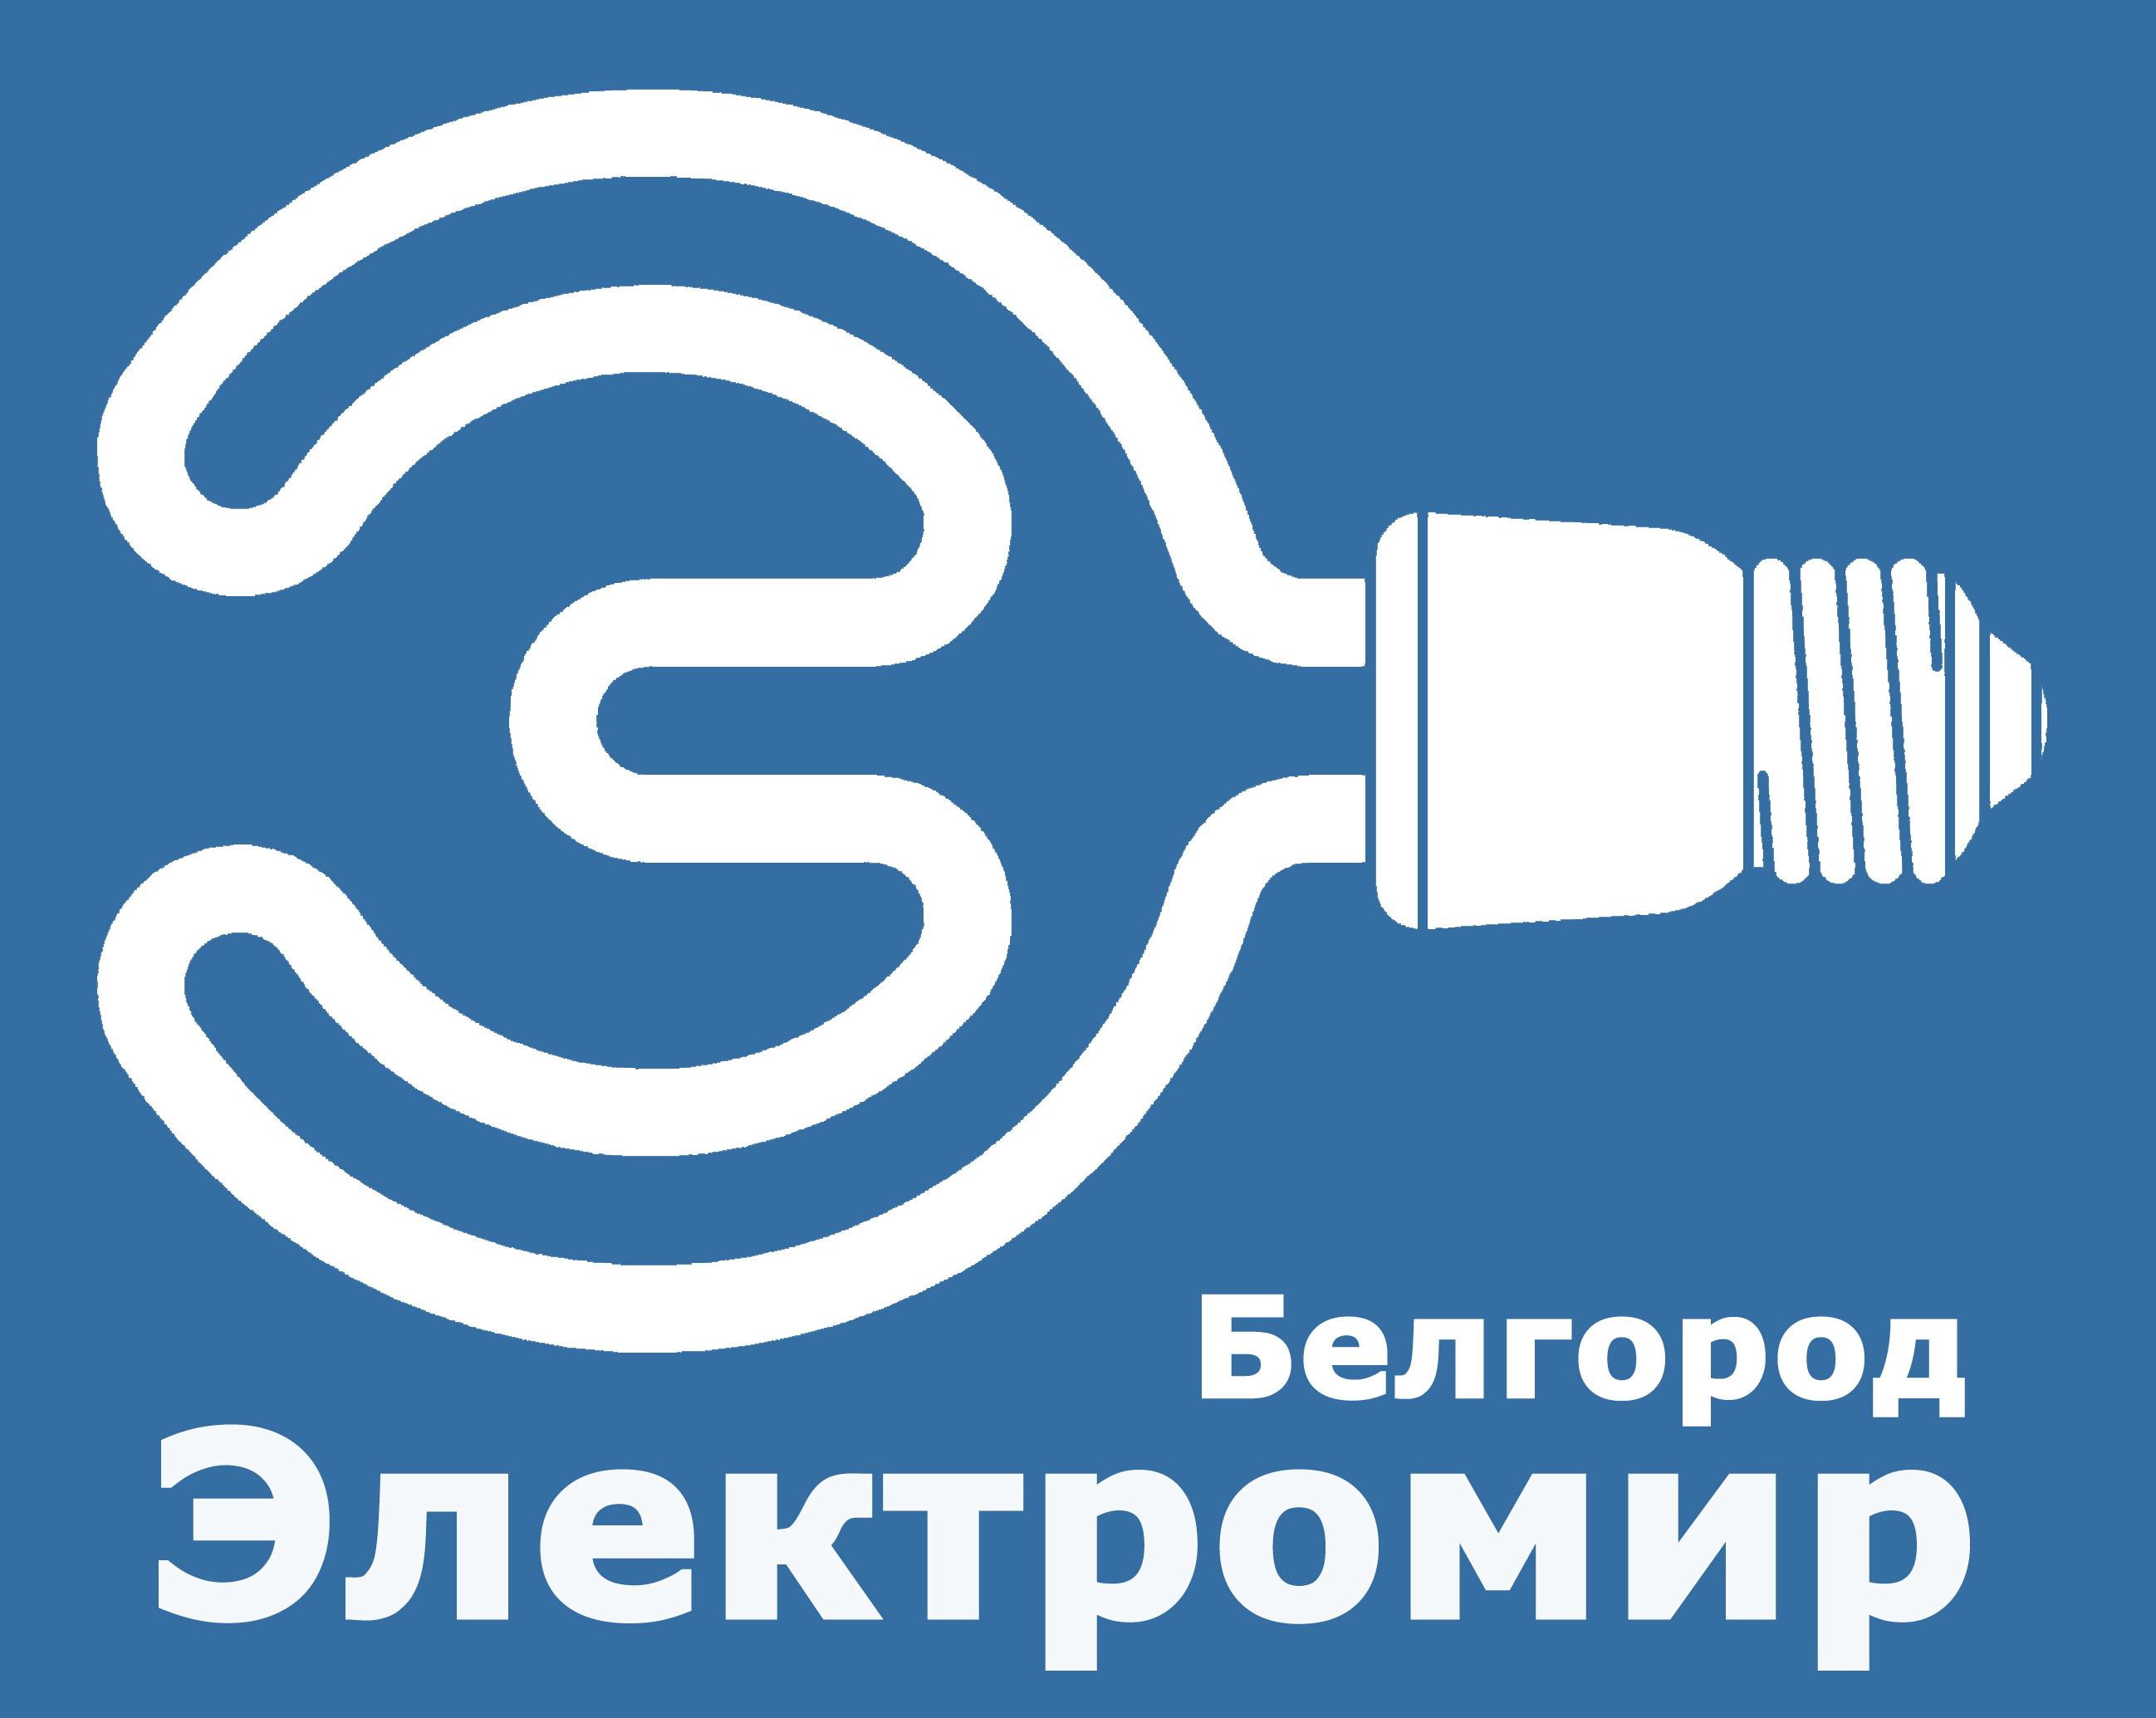 ЭЛЕКТРОМИР - ЧТОБЫ ВАША ЭНЕРГИЯ НЕ КОНЧАЛАСЬ!